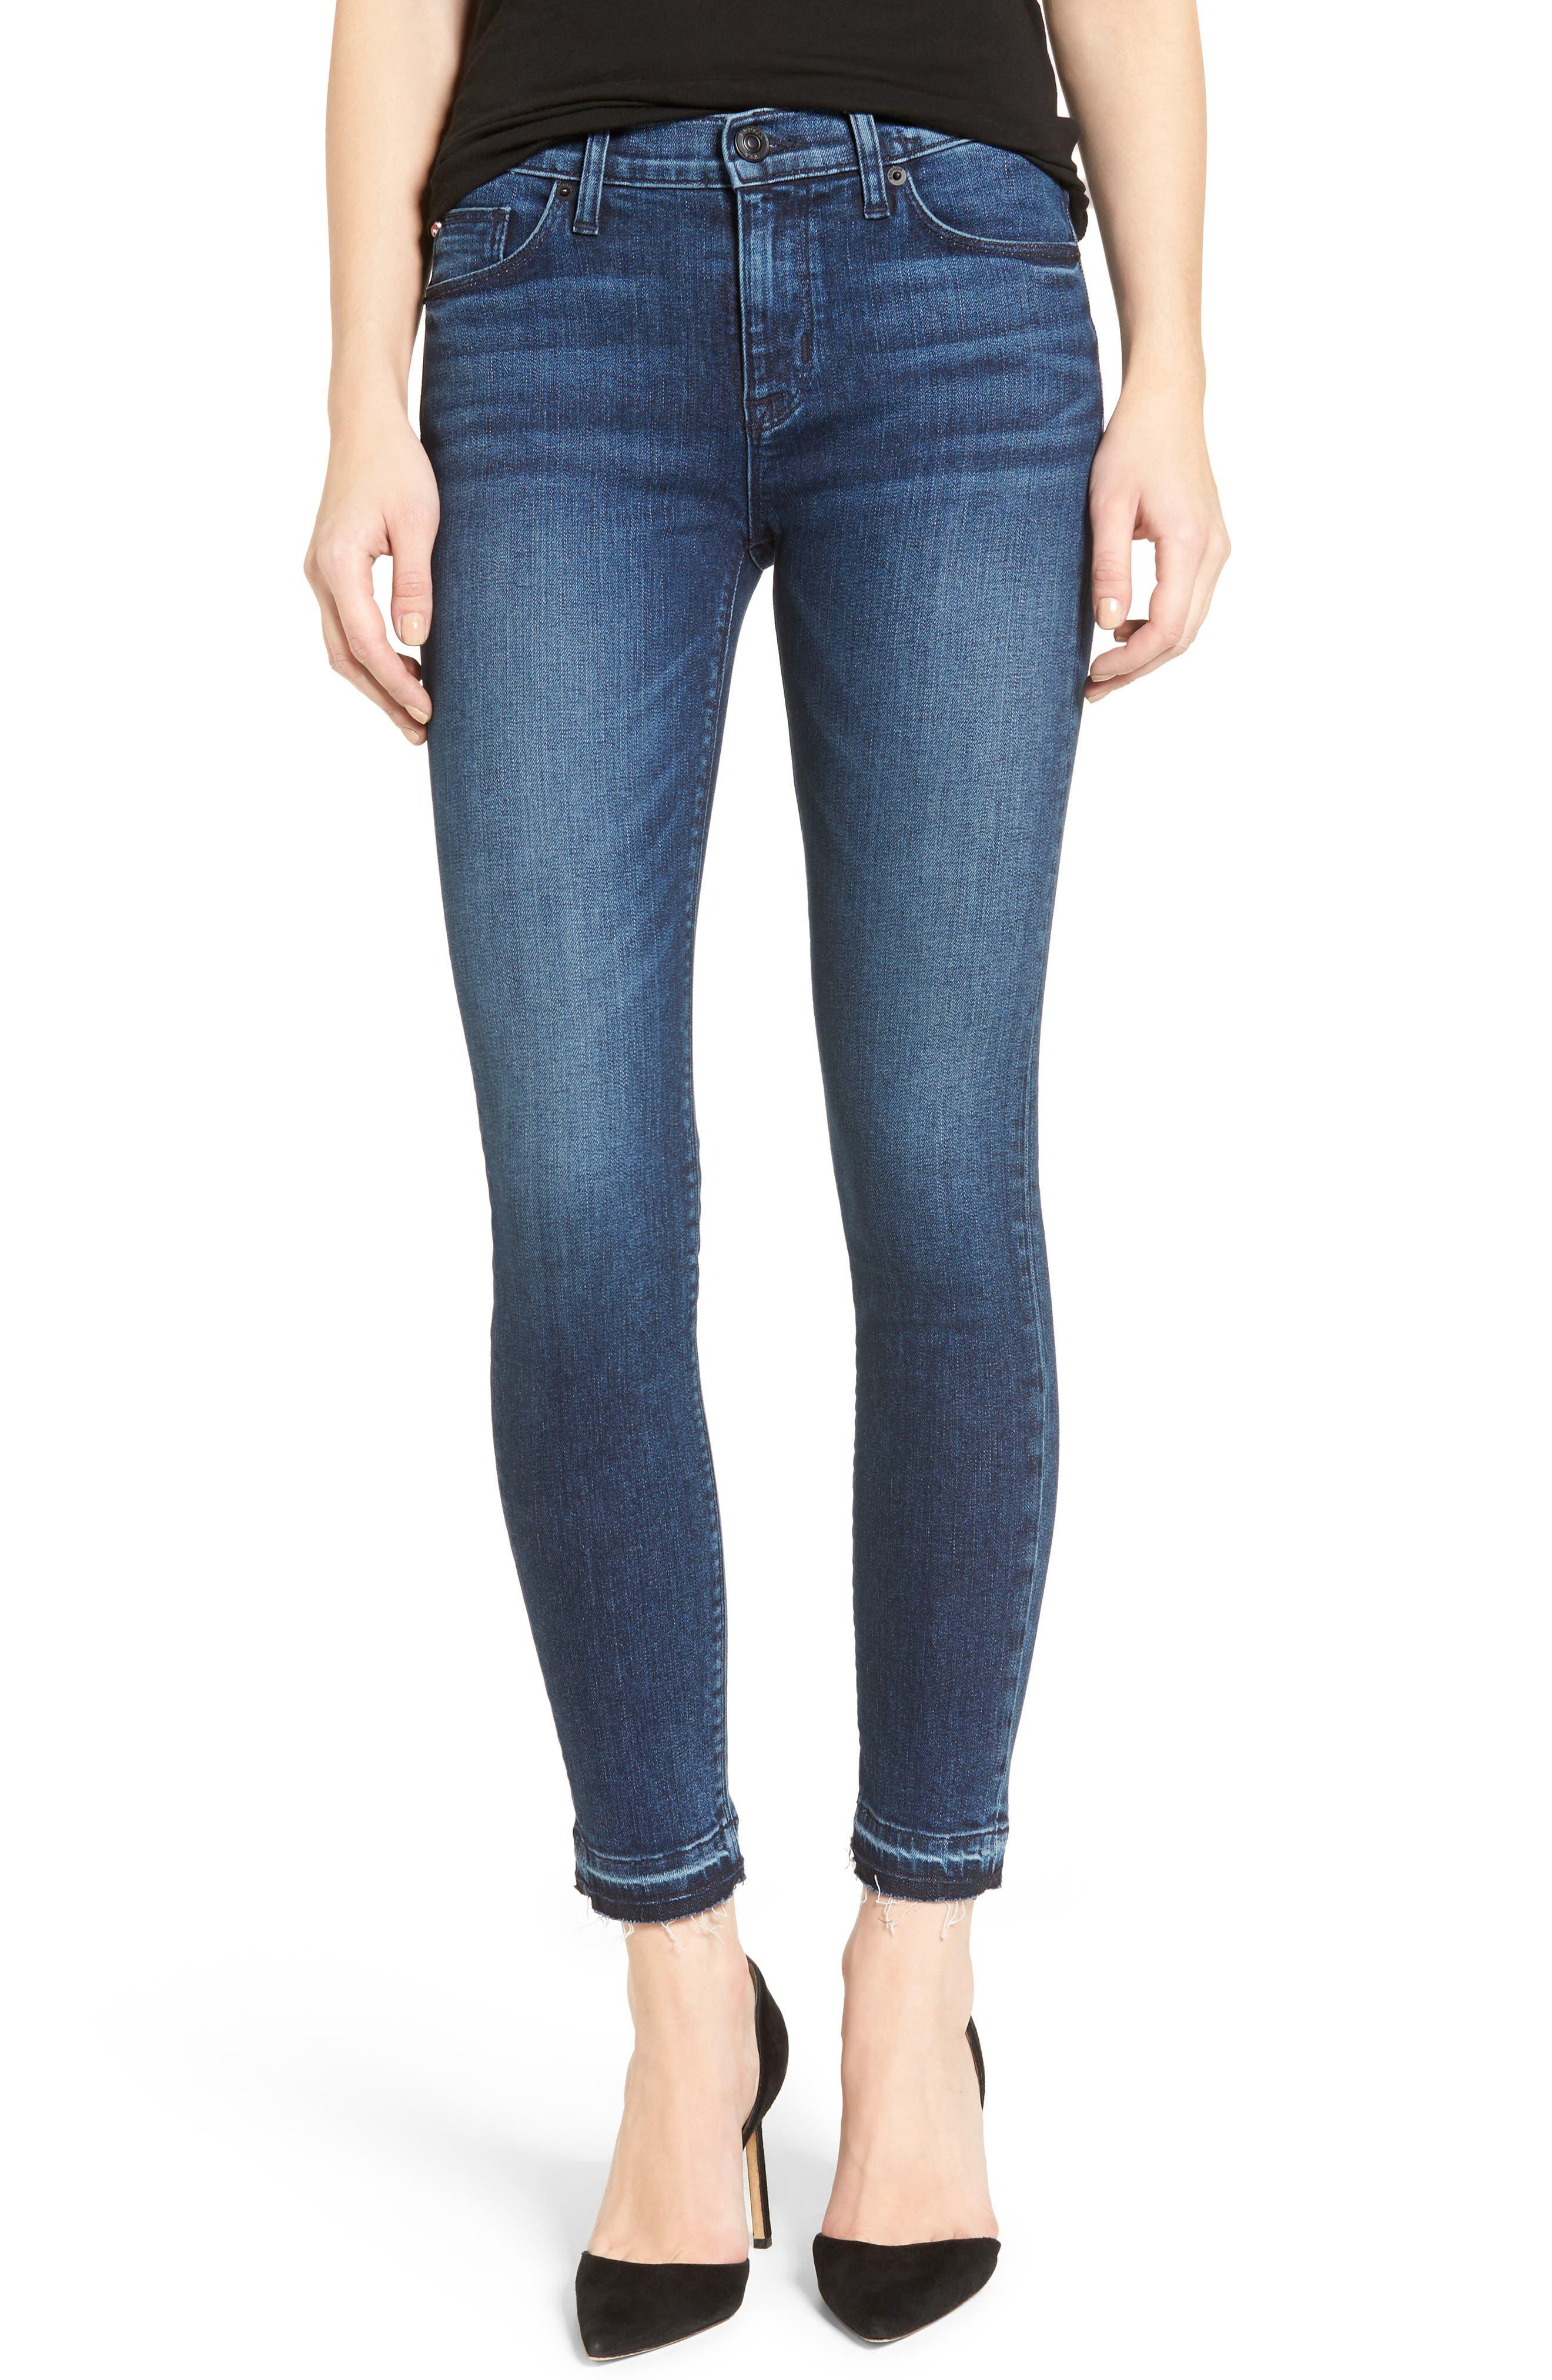 Main Image - Hudson Jeans Nico Released Hem Ankle Skinny Jeans